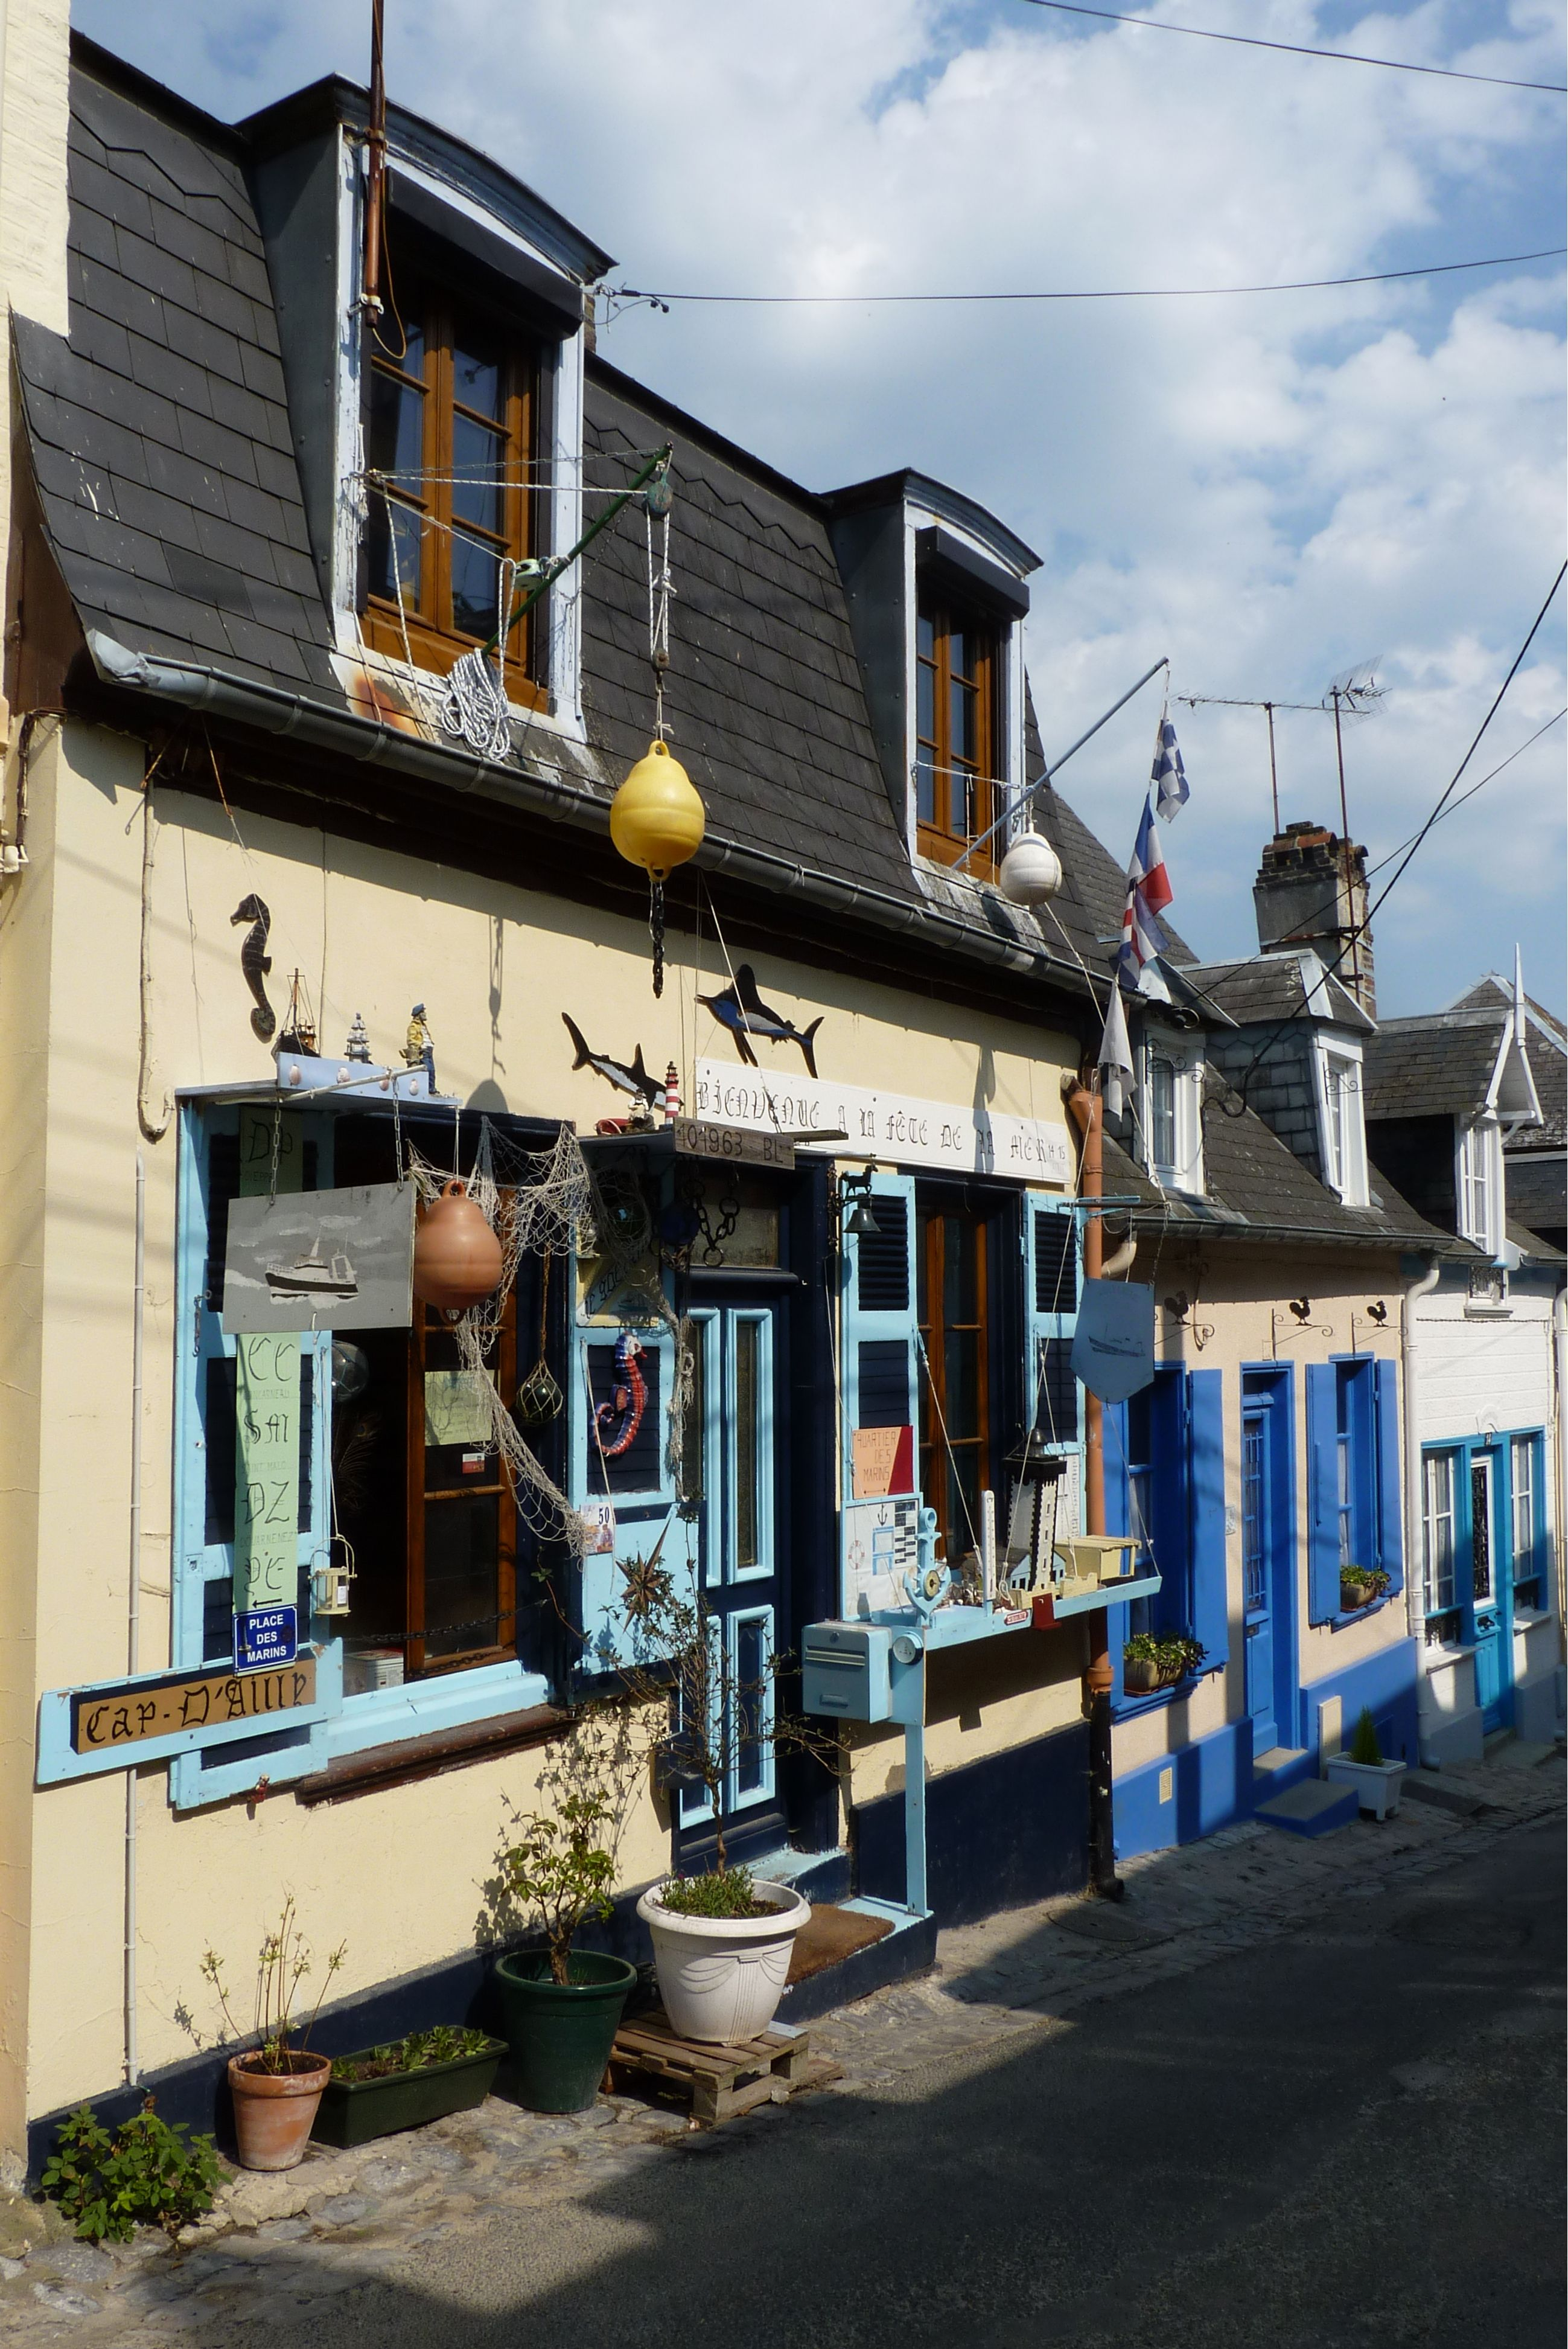 Saint Valery Sur Somme Flickr Photo Sharing European Architecture Places Somme